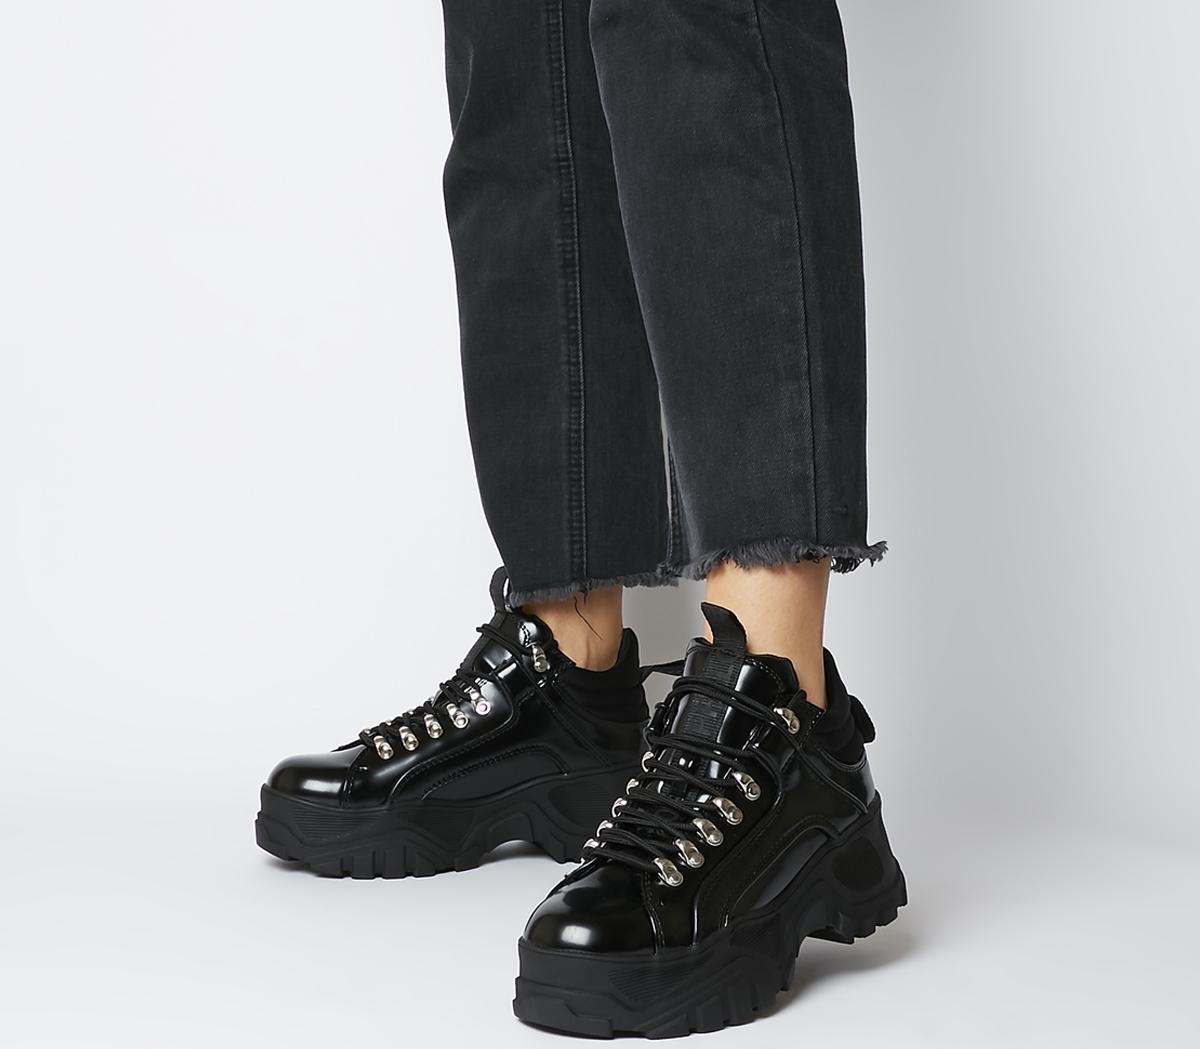 Fina Low Lace Up Shoes